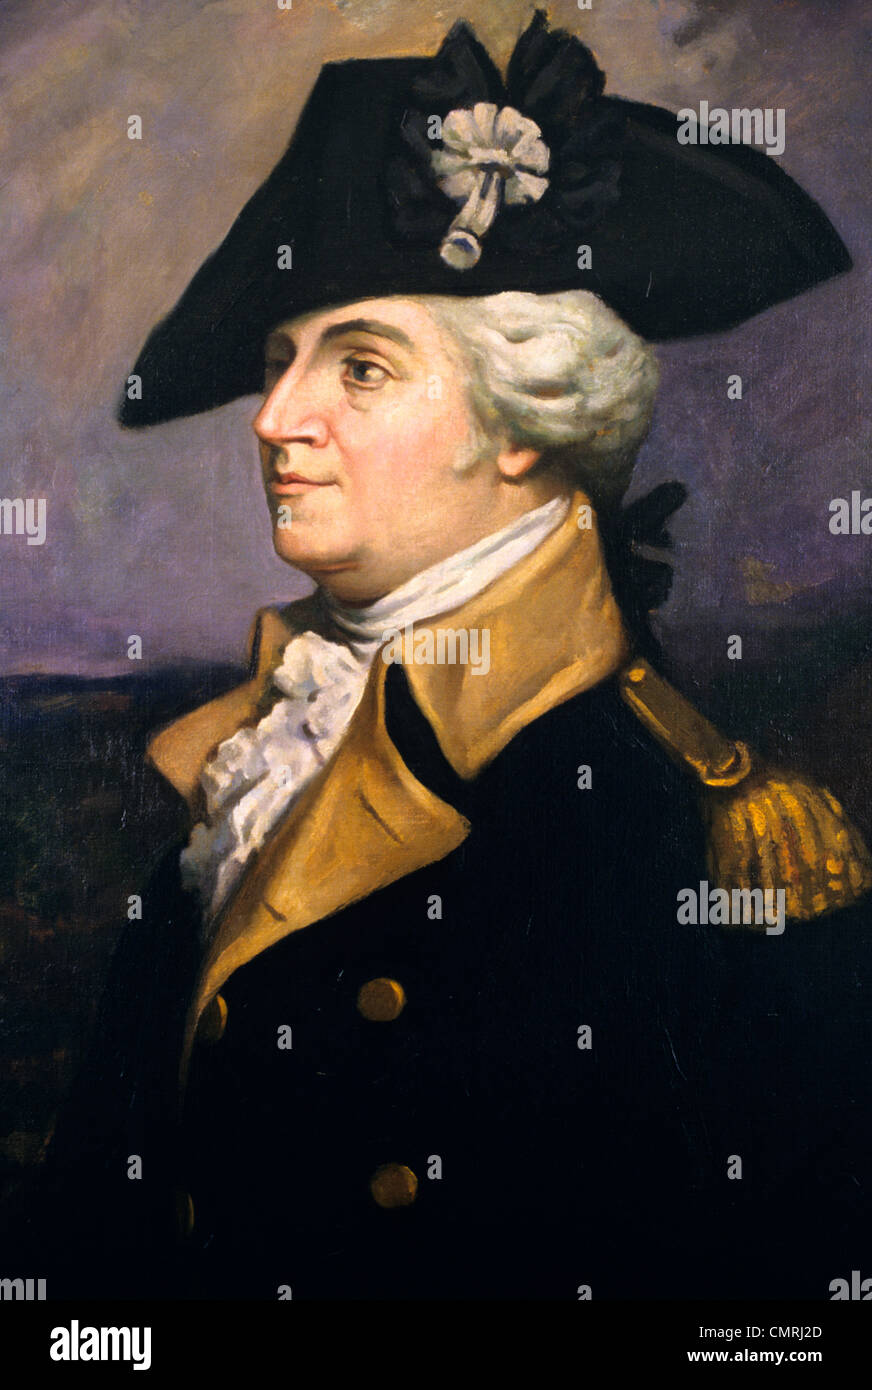 1770s 1780s 1790s PORTRAIT PAINTING AMERICAN REVOLUTION